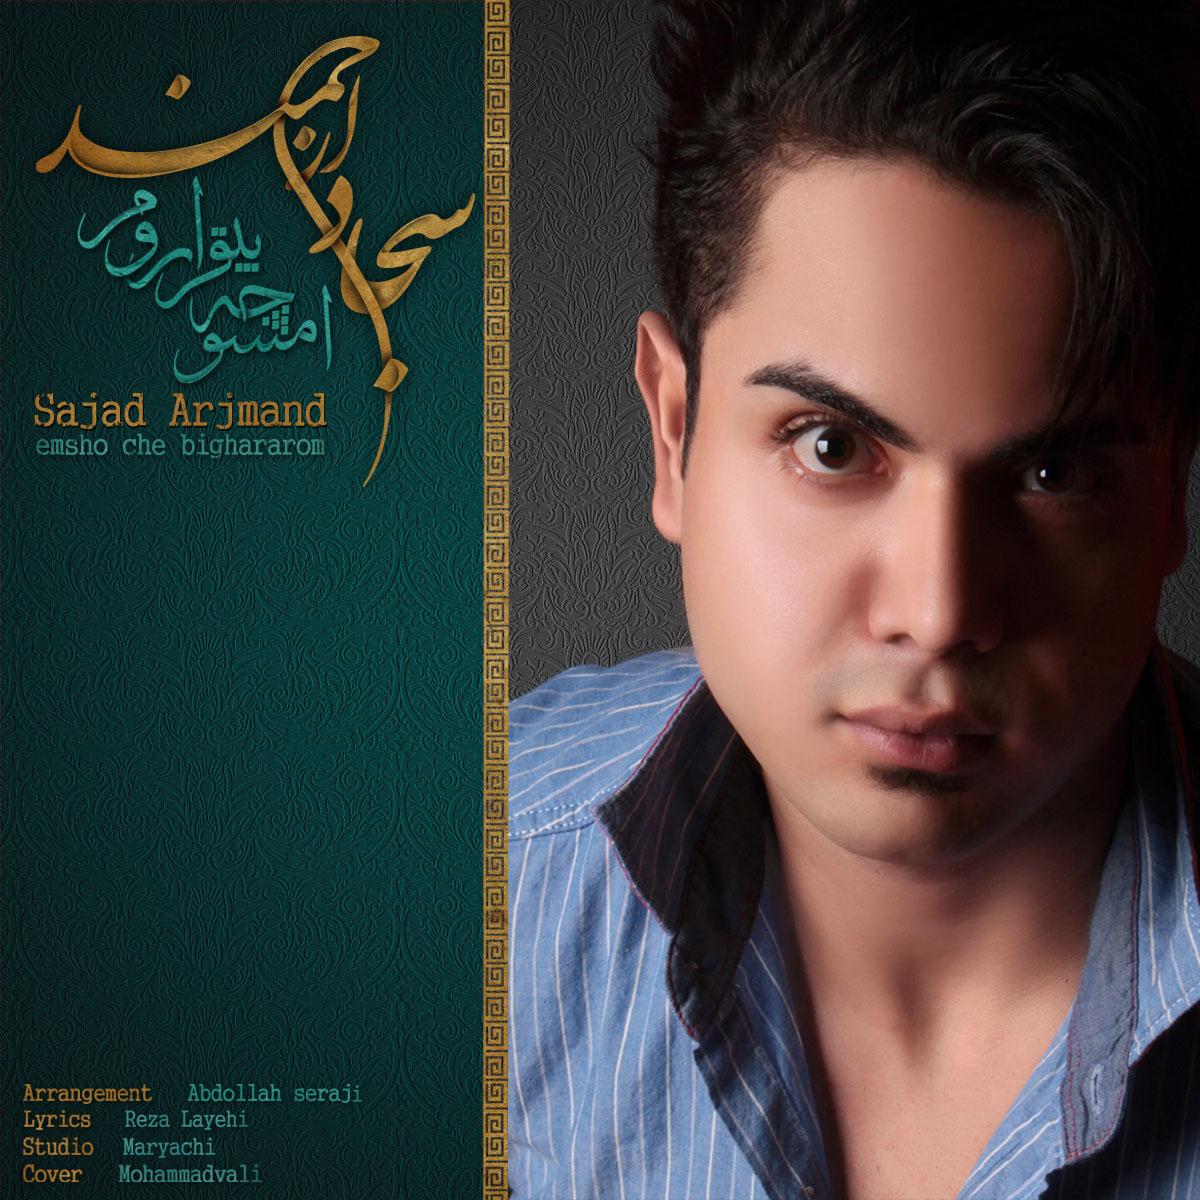 Sajad Arjmand – Emsho Che Bighararom